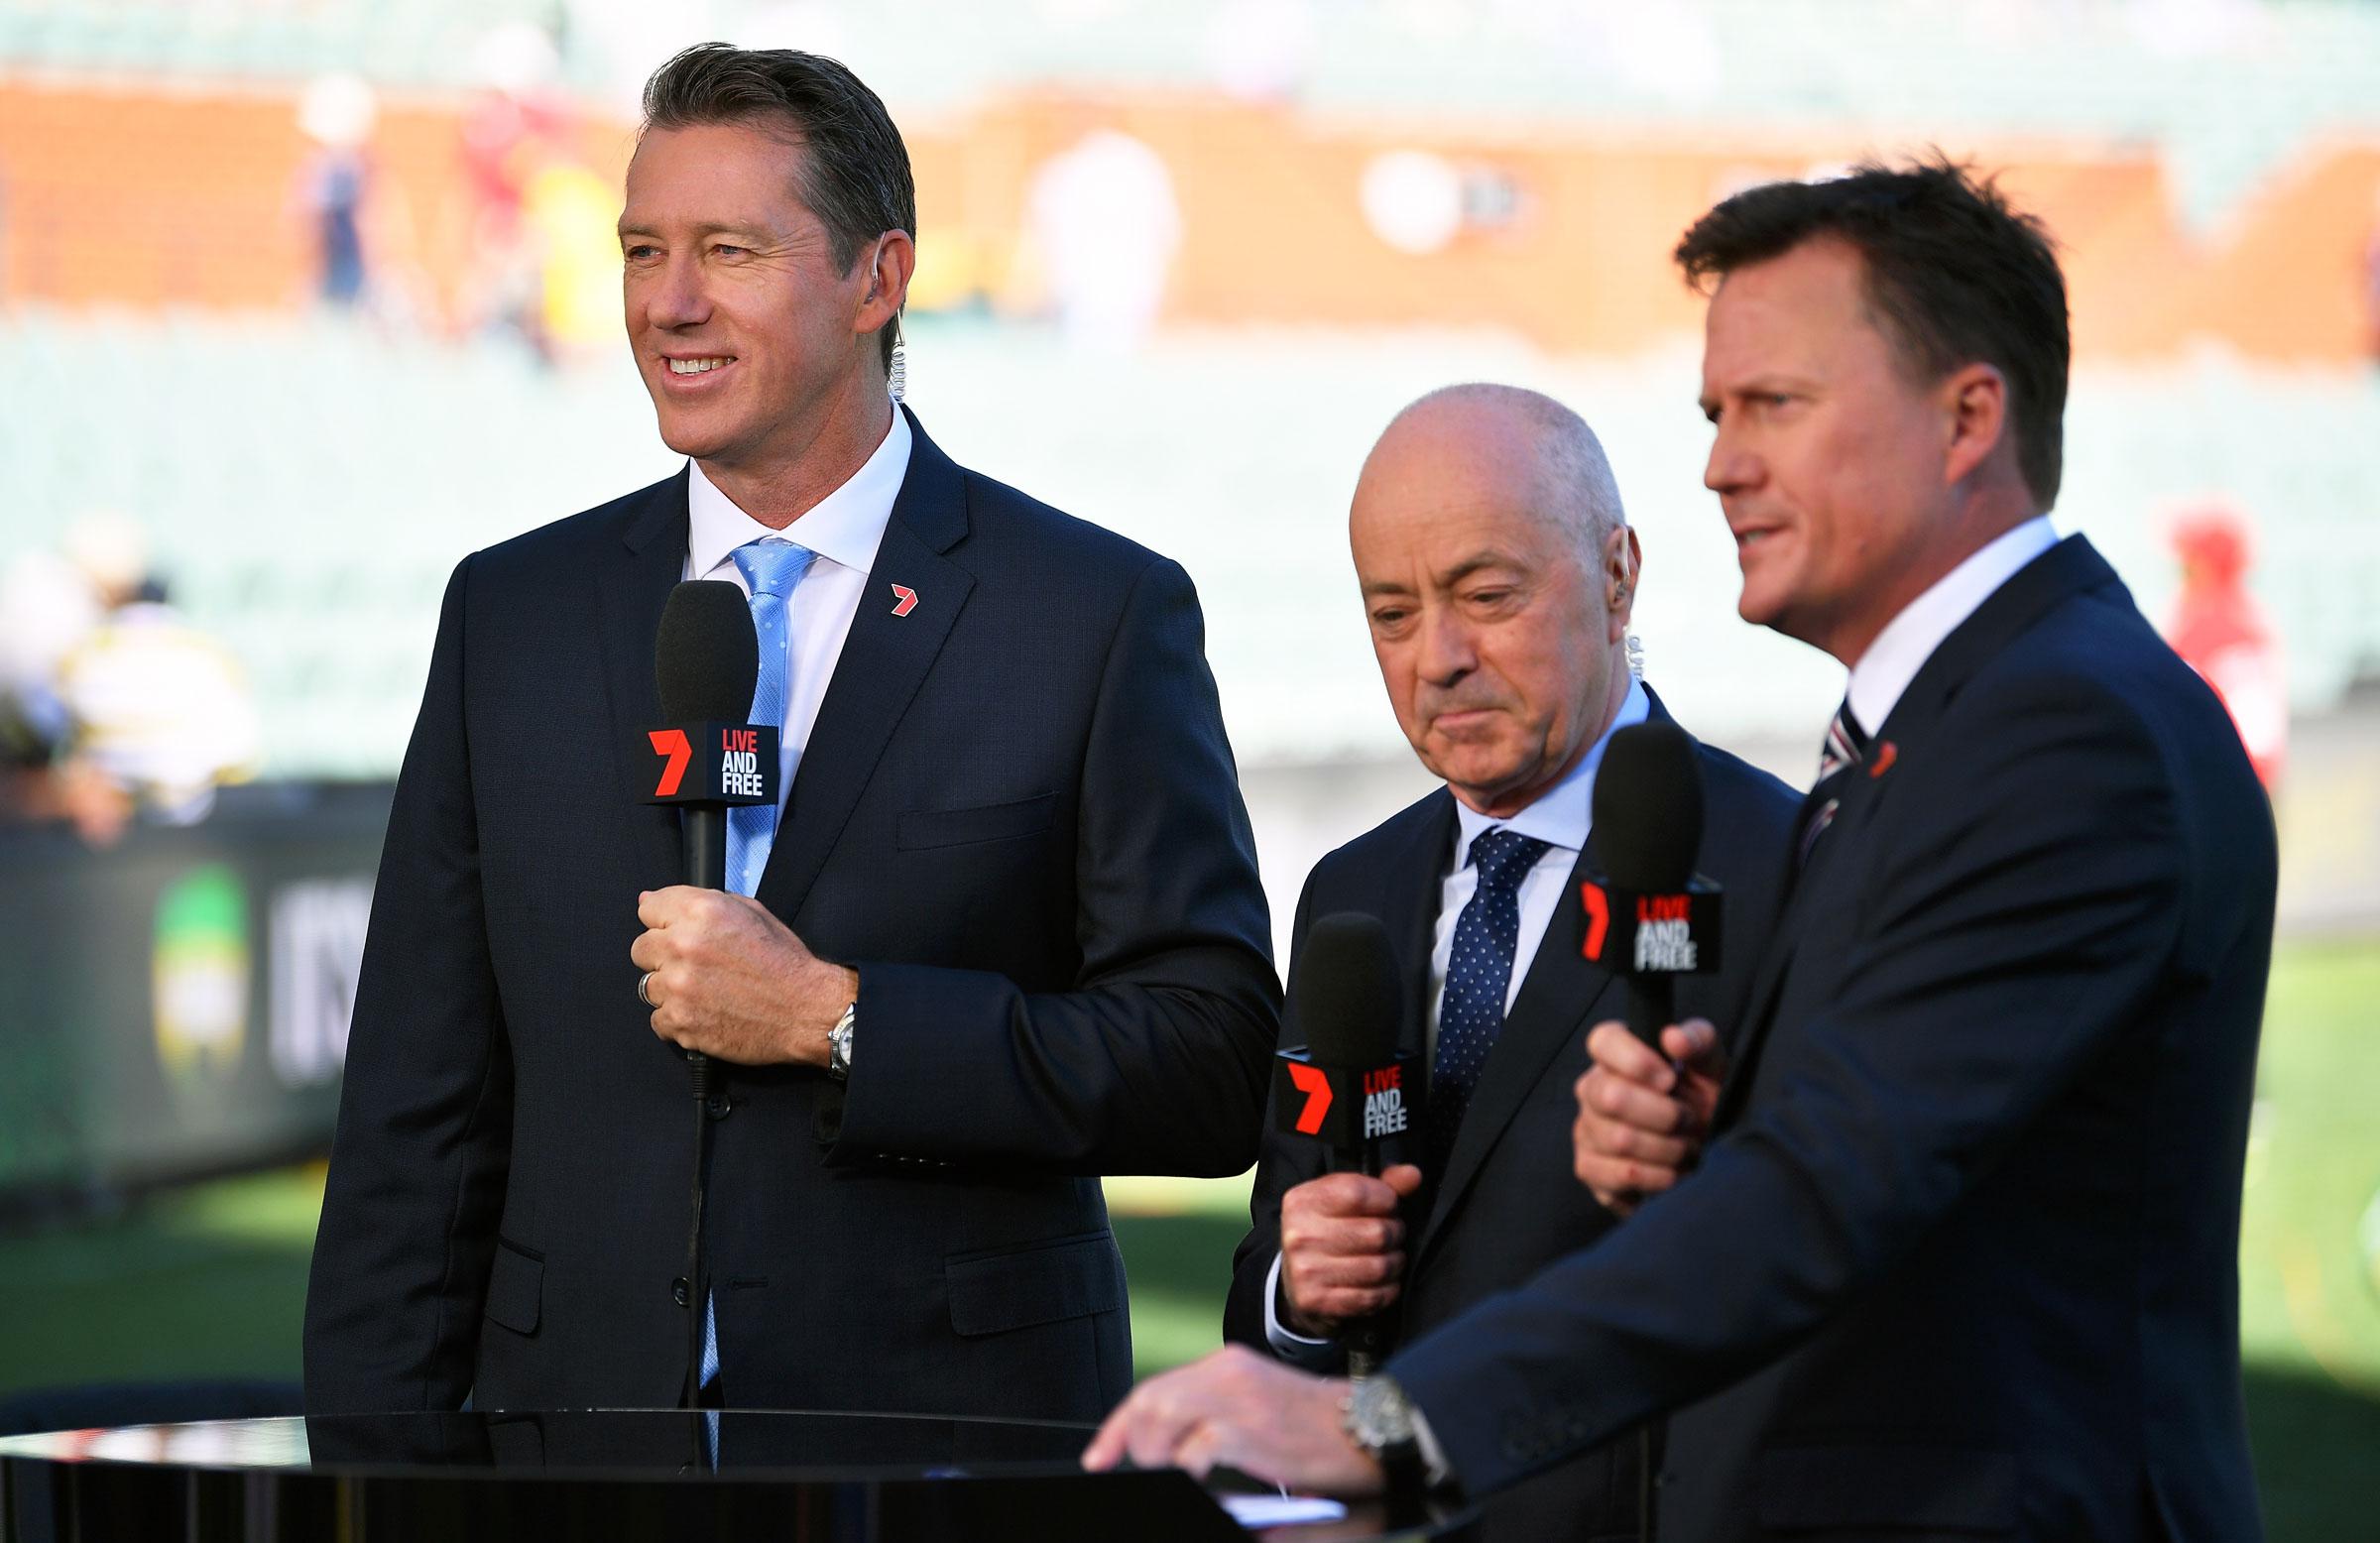 Glenn McGrath, Tim Lane & James Brayshaw // Getty Images